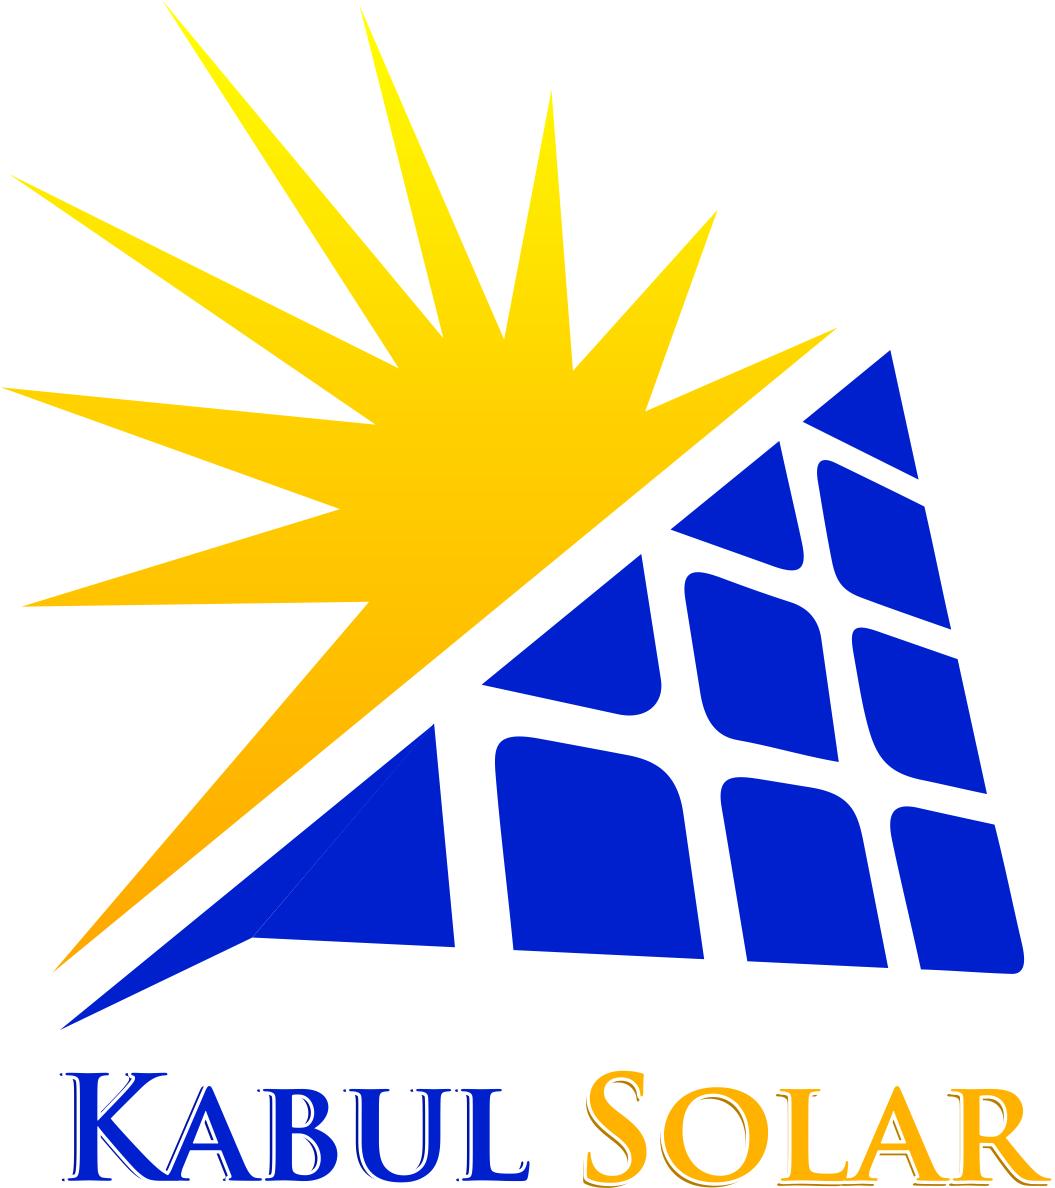 Kabul Solar